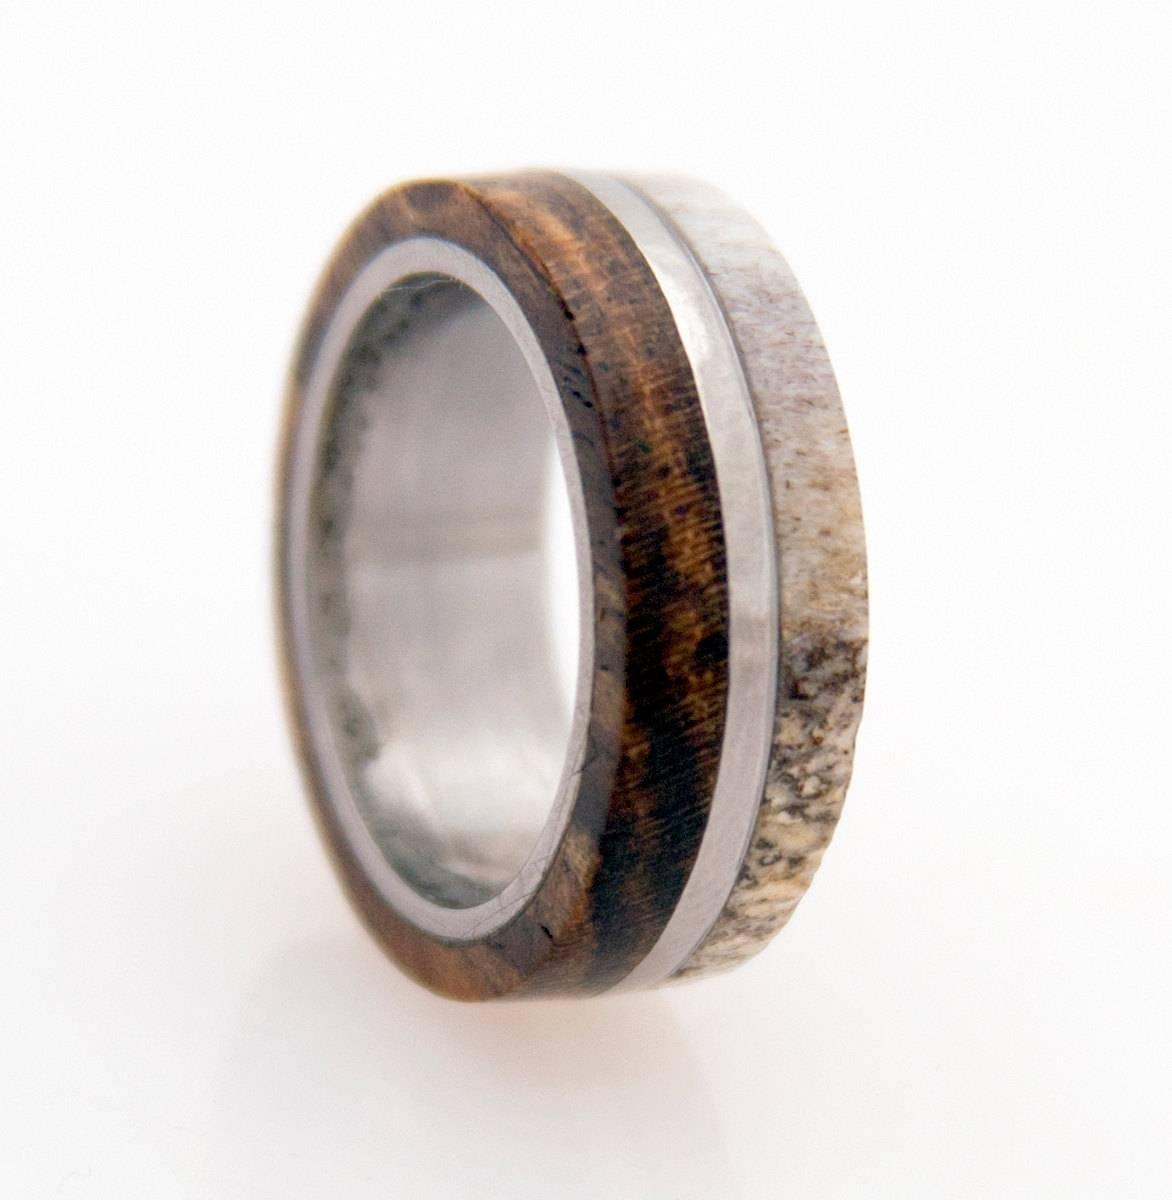 Antler Ring Titanium Ring With Wood Bocote Deer Antler Band In Antler Wedding Bands (View 2 of 15)